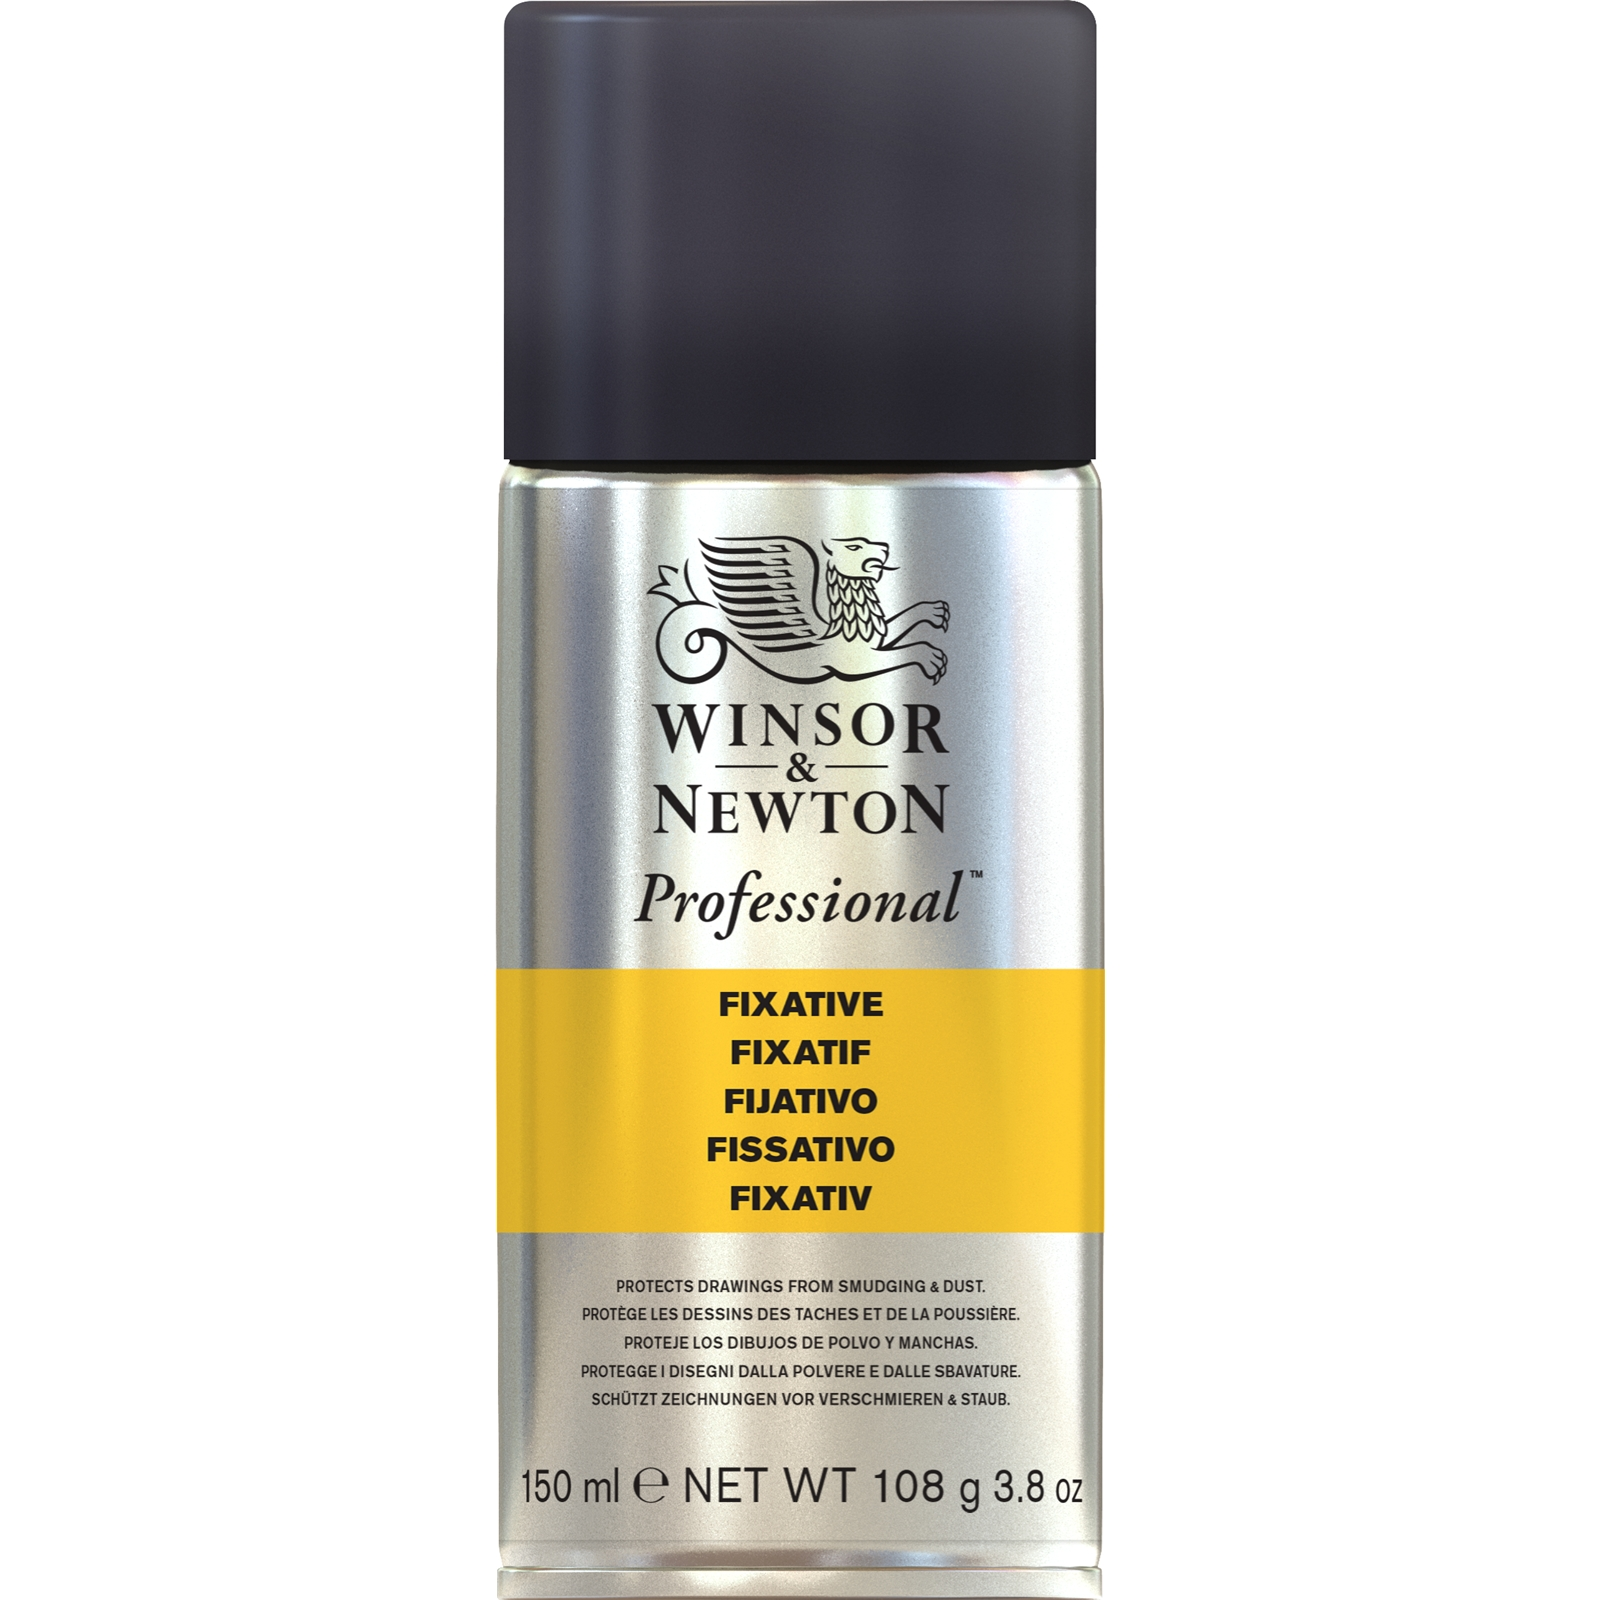 Winsor & Newton Fixative Spray for Alcohol Ink